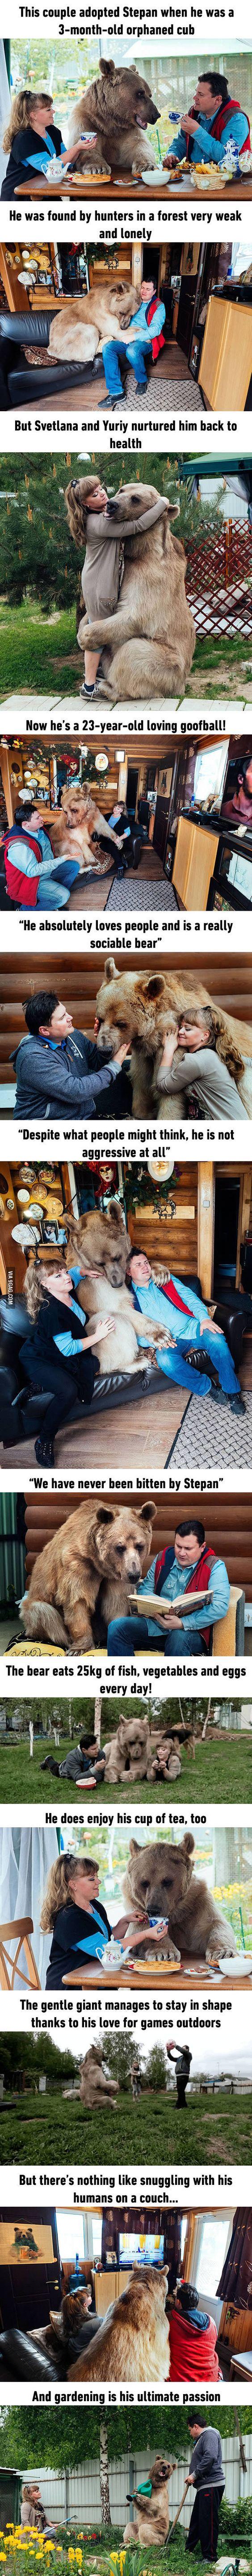 adopted-bear